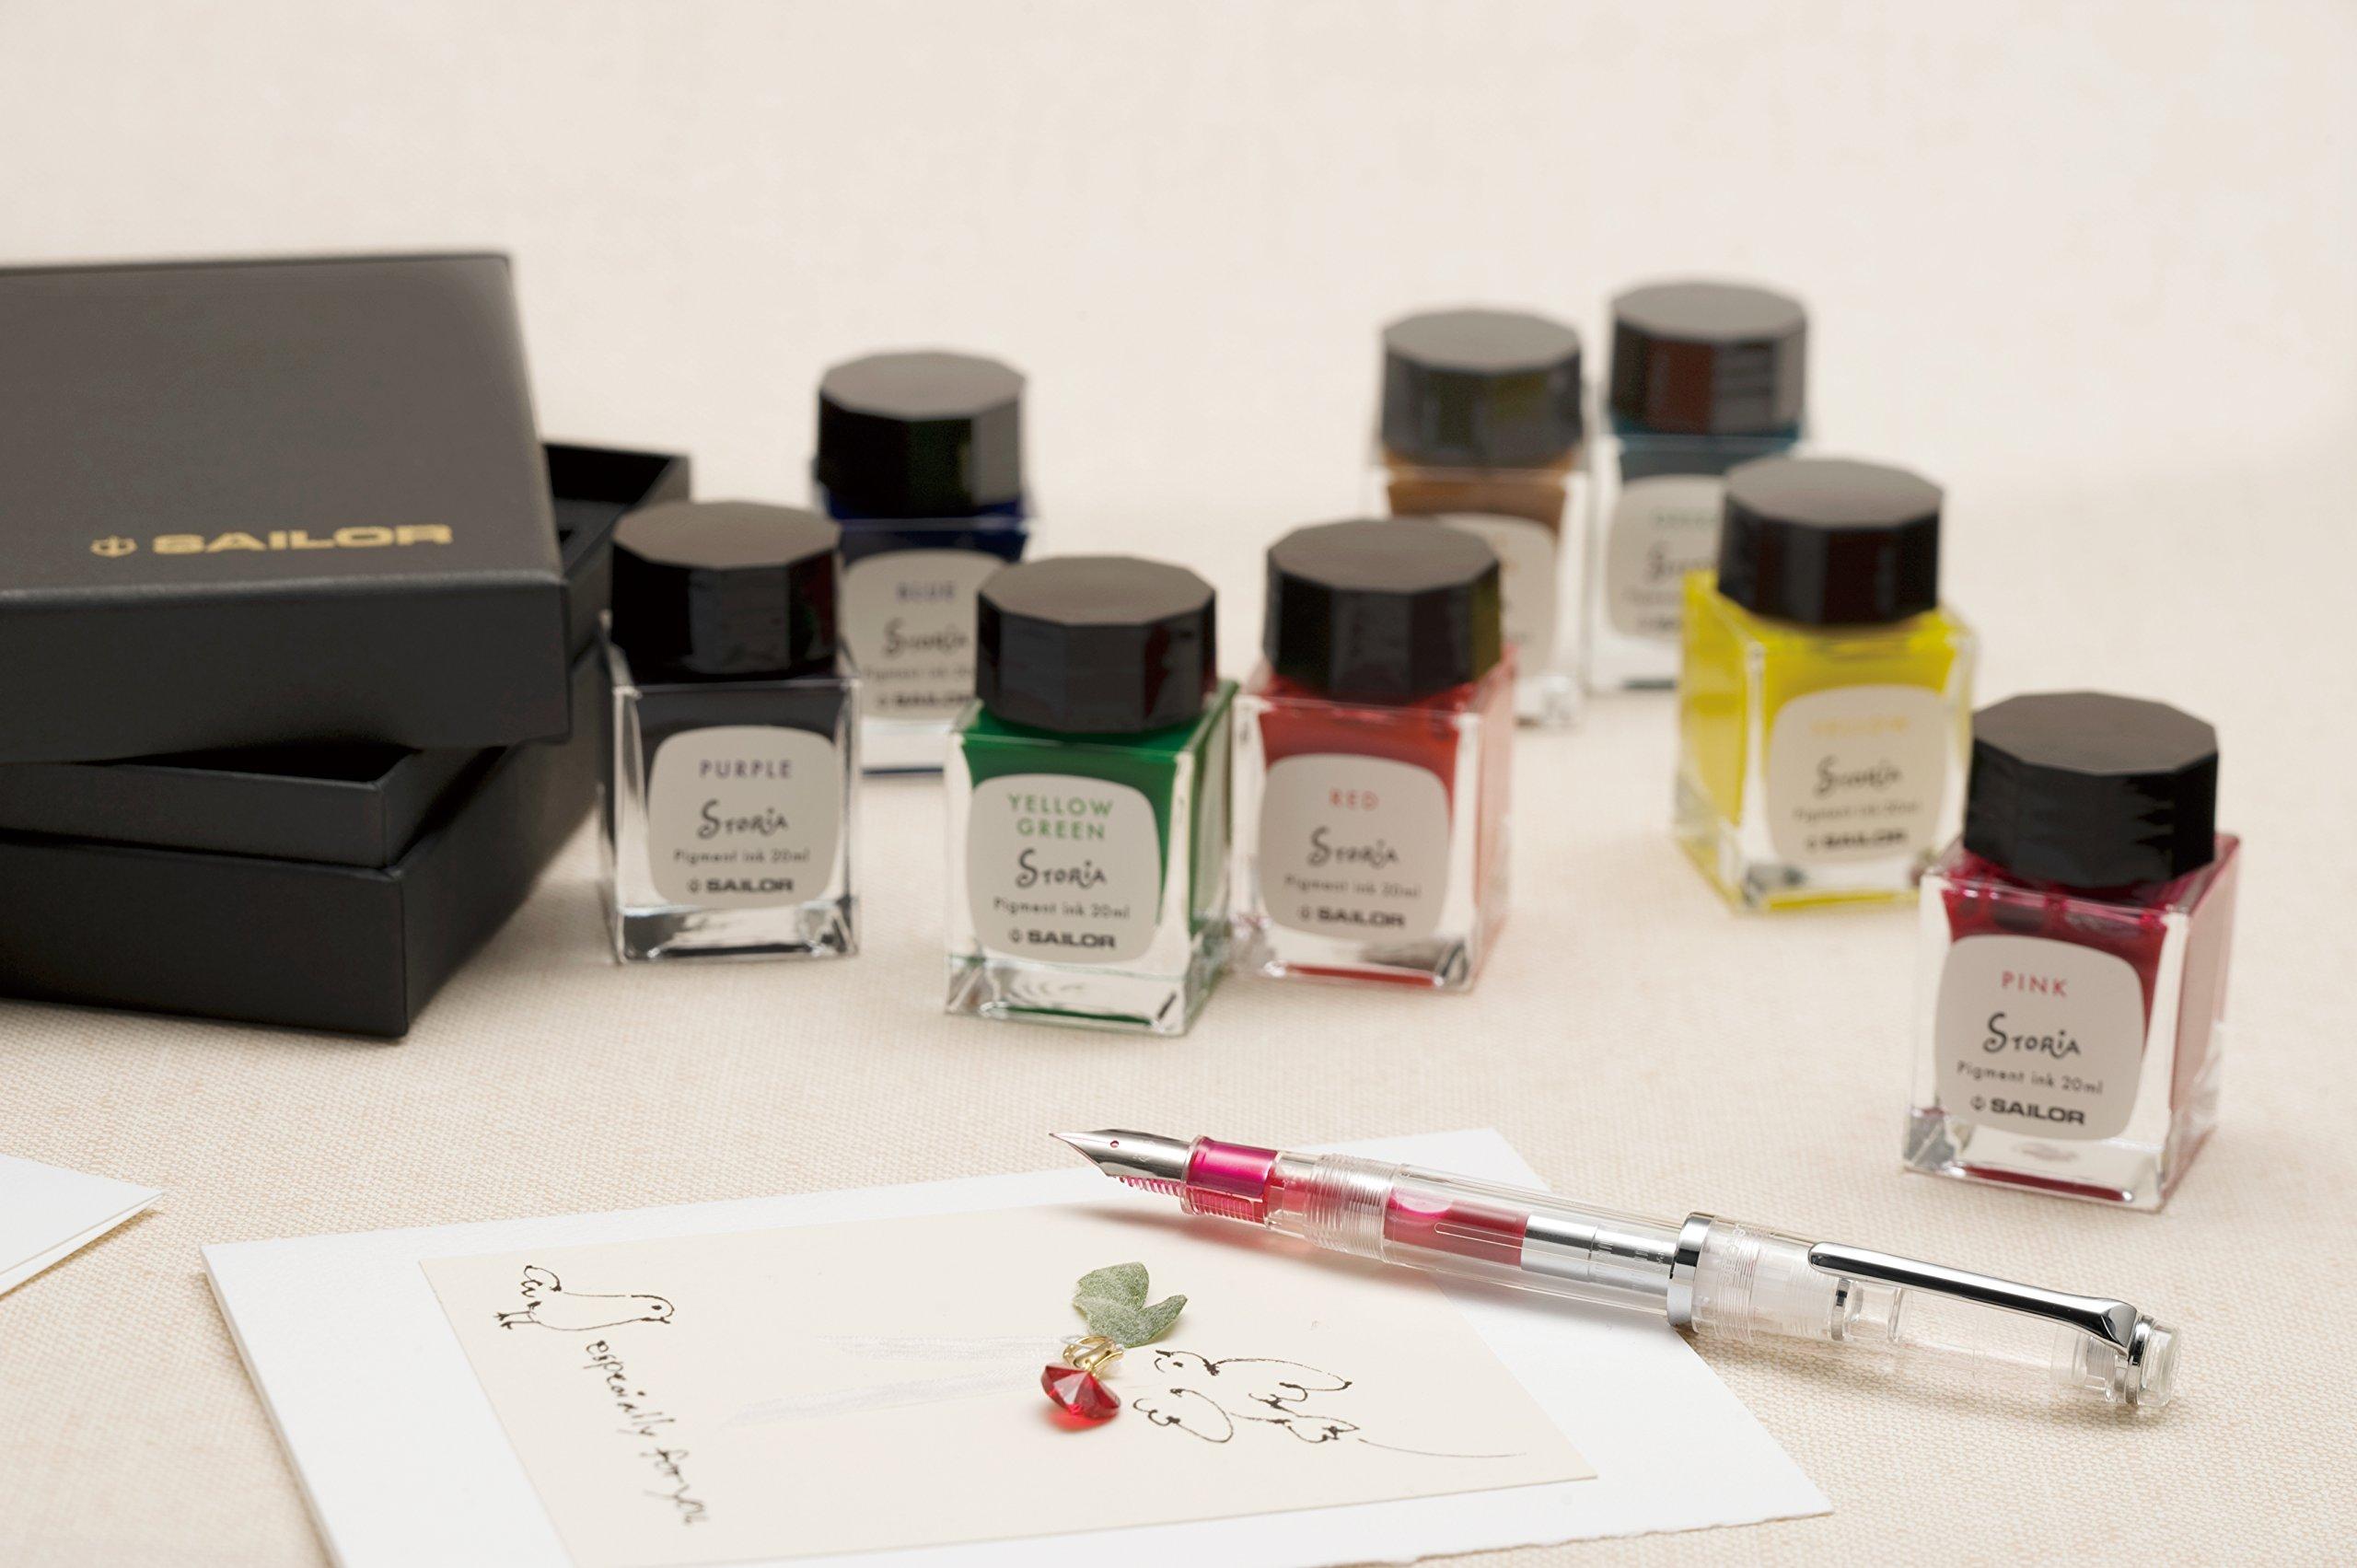 Sailor Fountain Pen mini Bottle 20ml Ink 8 Color Gift Set - Pigment Based '' STORiA '' by Sailor (Image #7)